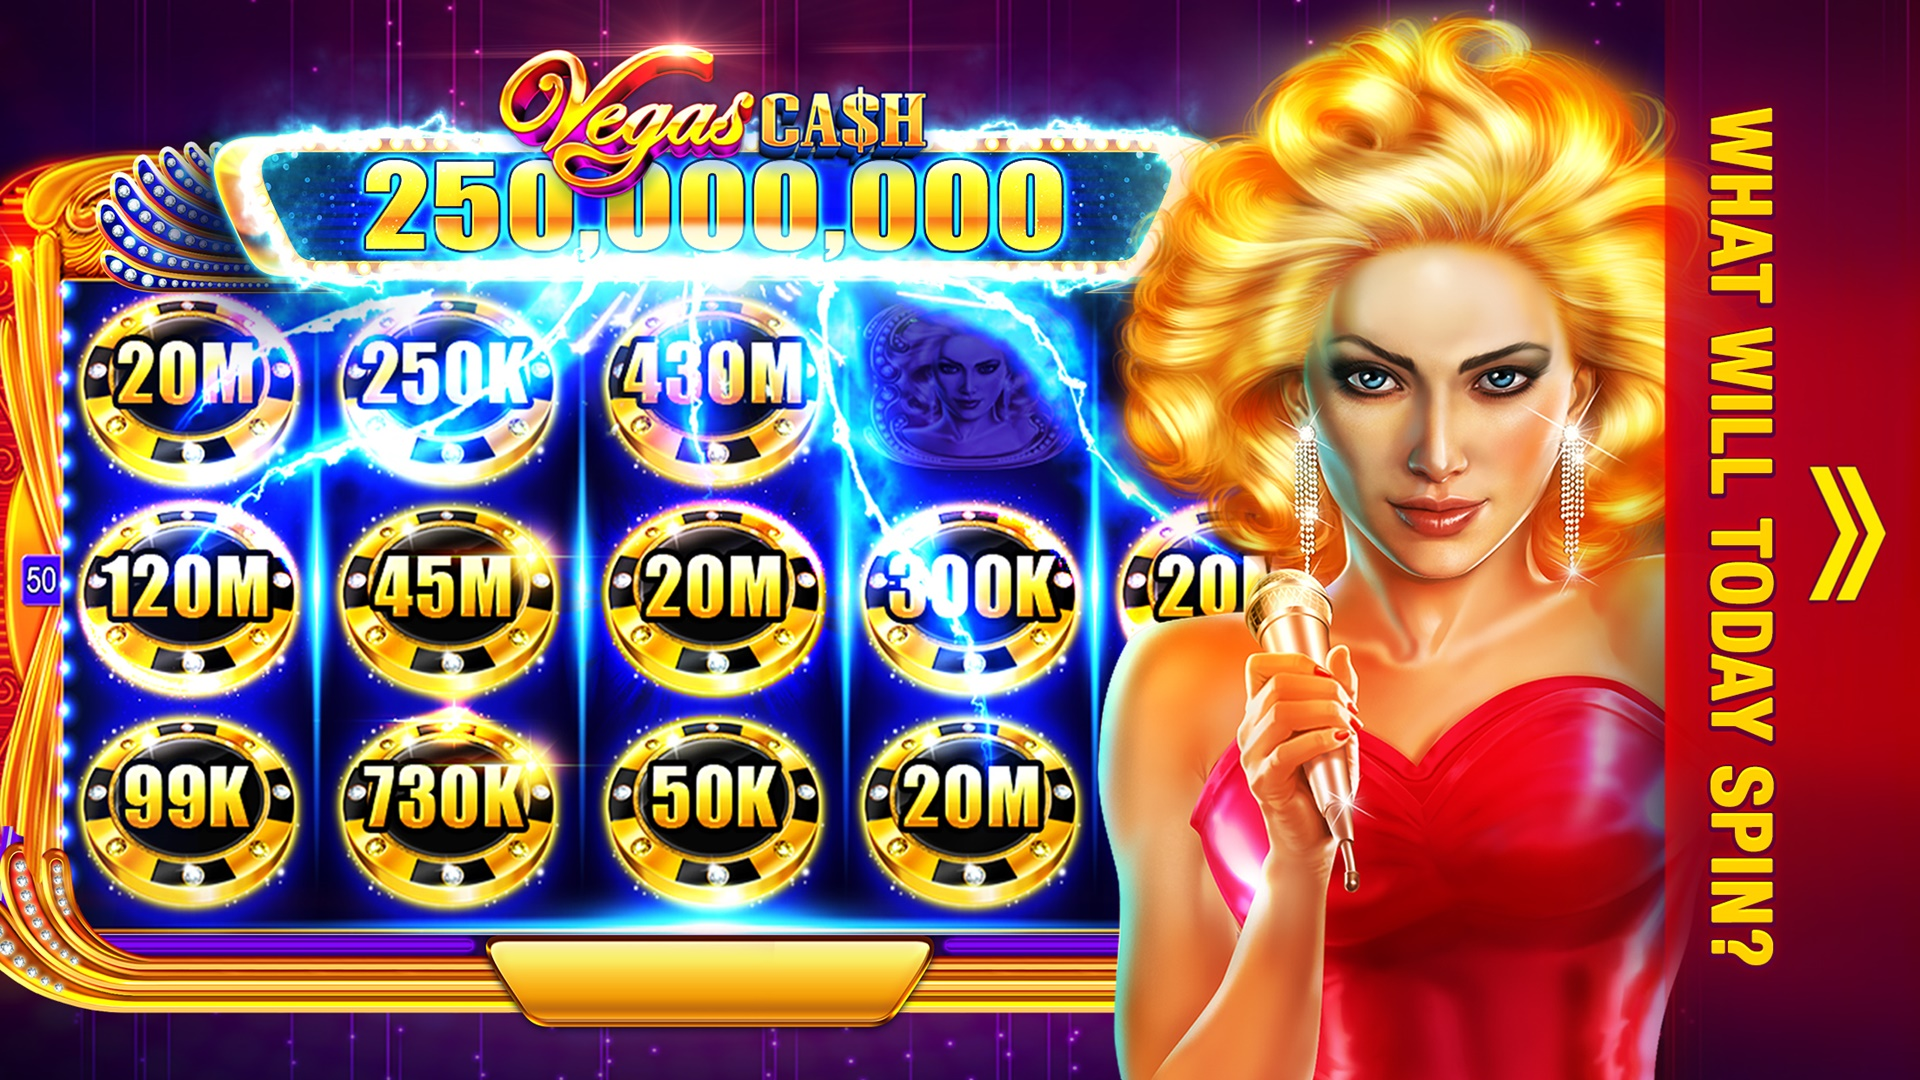 Las Vegas Slot Games Free